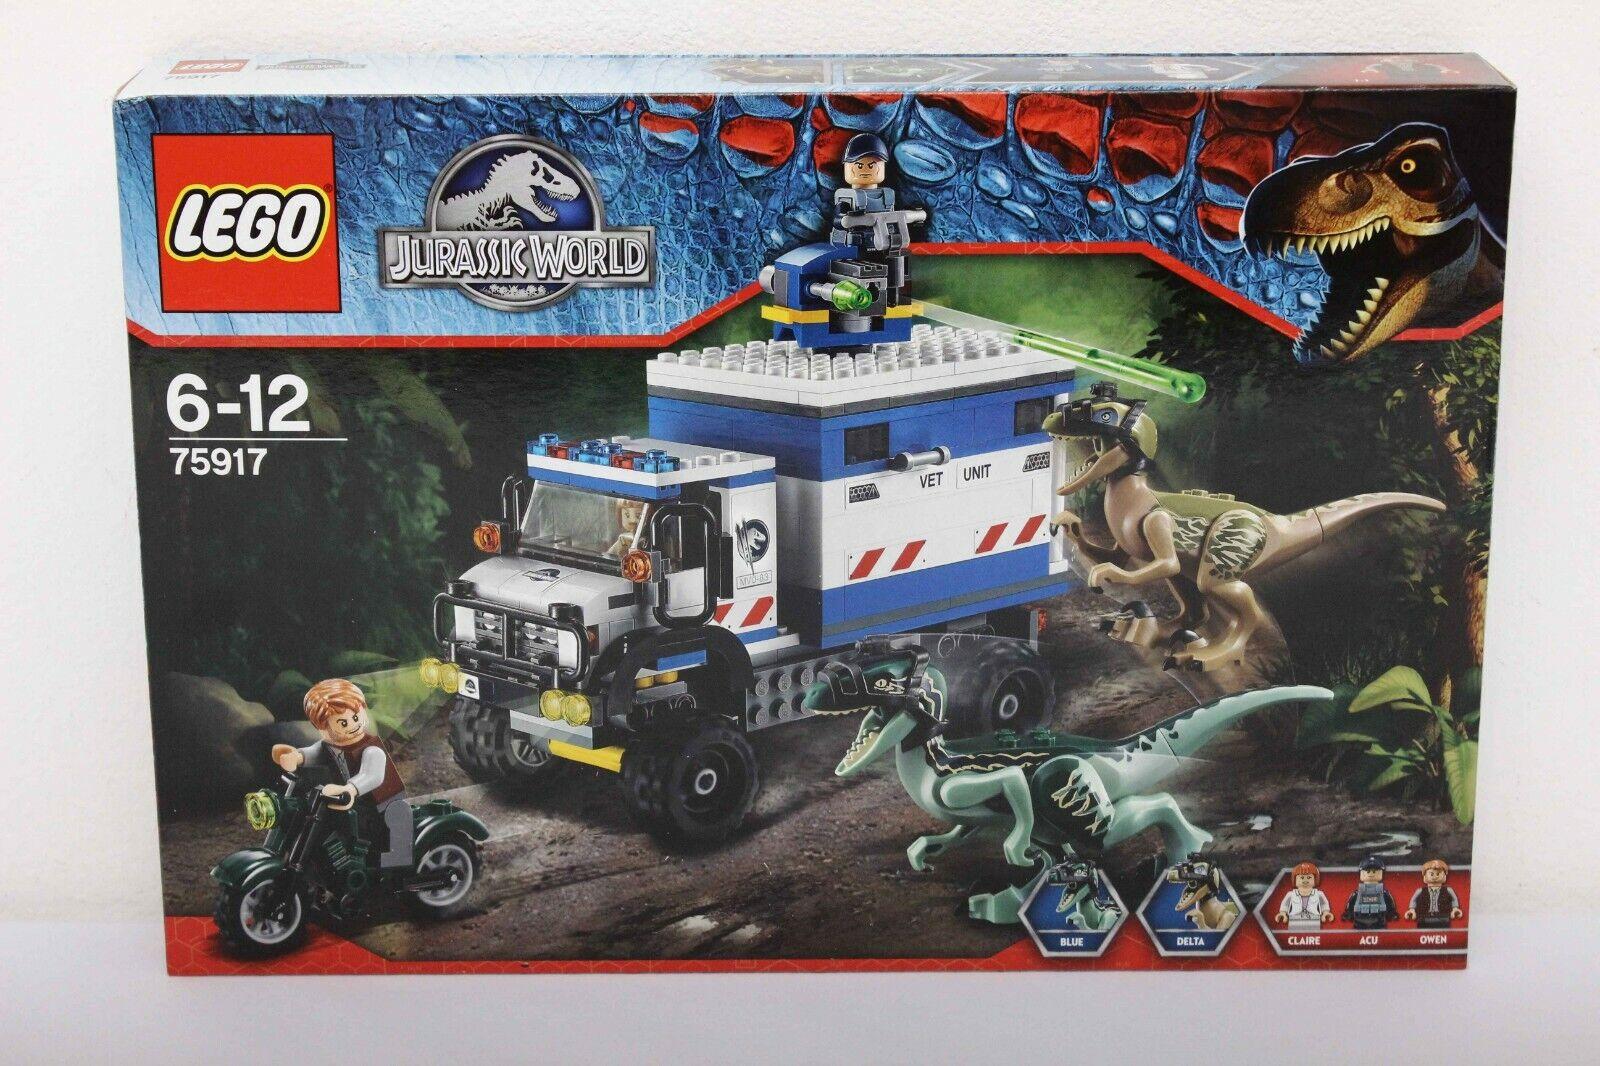 Lego Jurassic World Set 75917-1  Raptor Rampage - Brand nouveau Sealed Box  sortie de vente pas cher en ligne